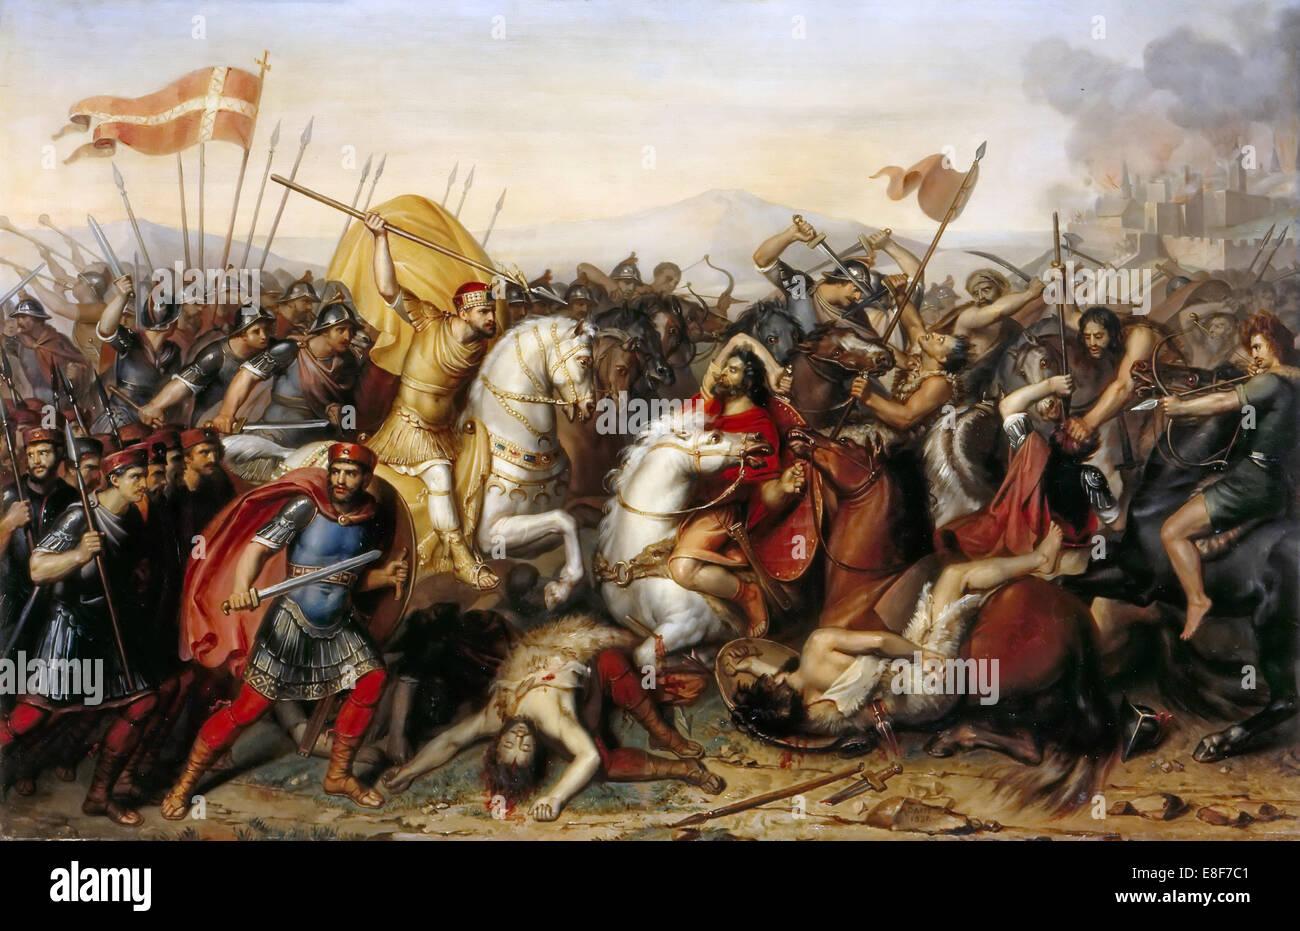 The Battle of Saucourt-en-Vimeu on 3 August 881. Artist: Dassy, Jean-Joseph (1791-1865) - Stock Image